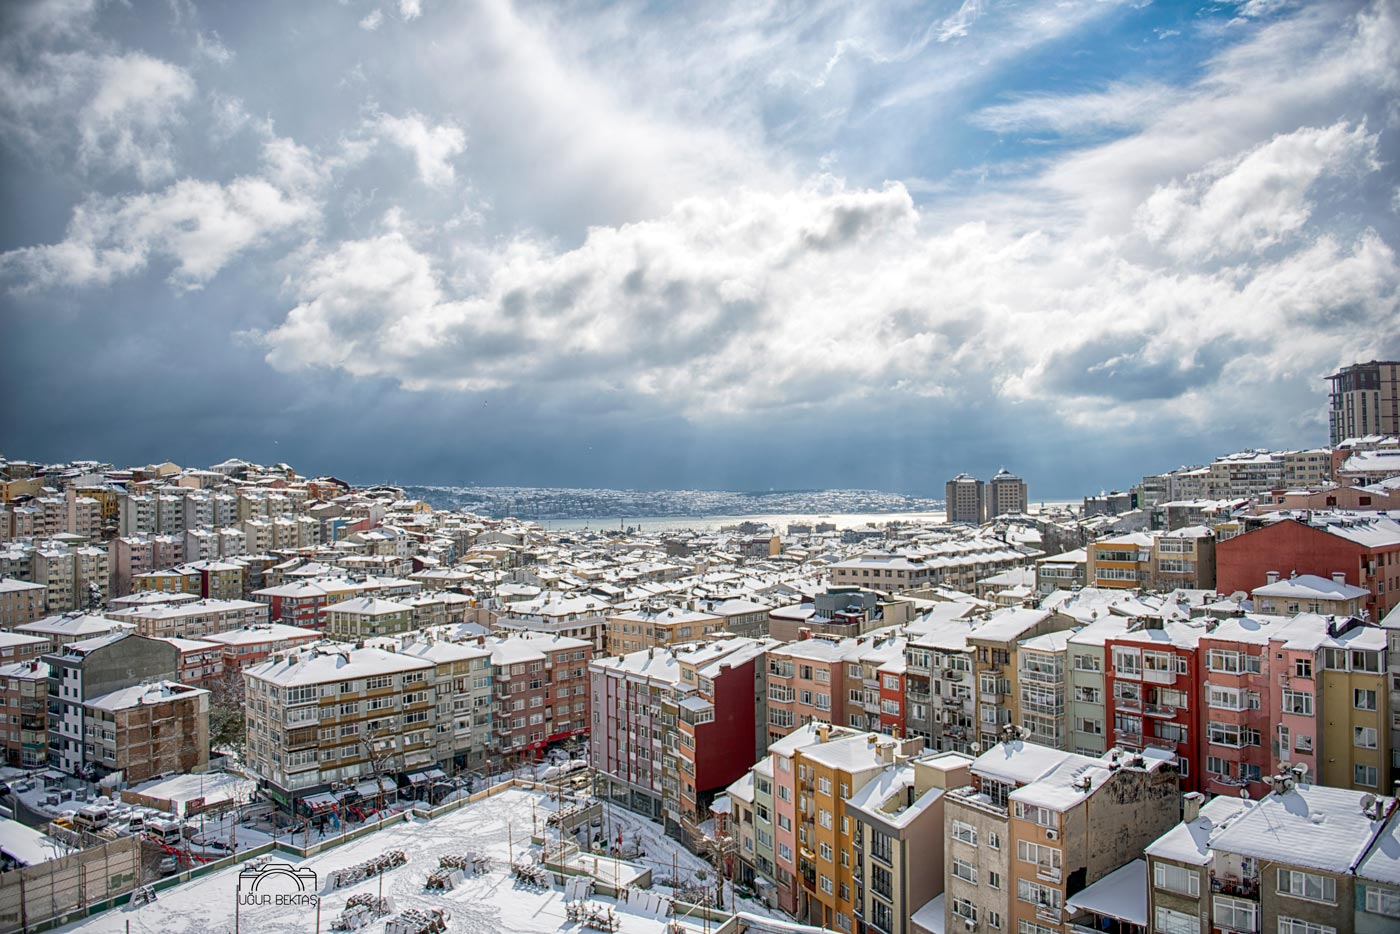 istanbul_kis_fotograflari_2_.jpg